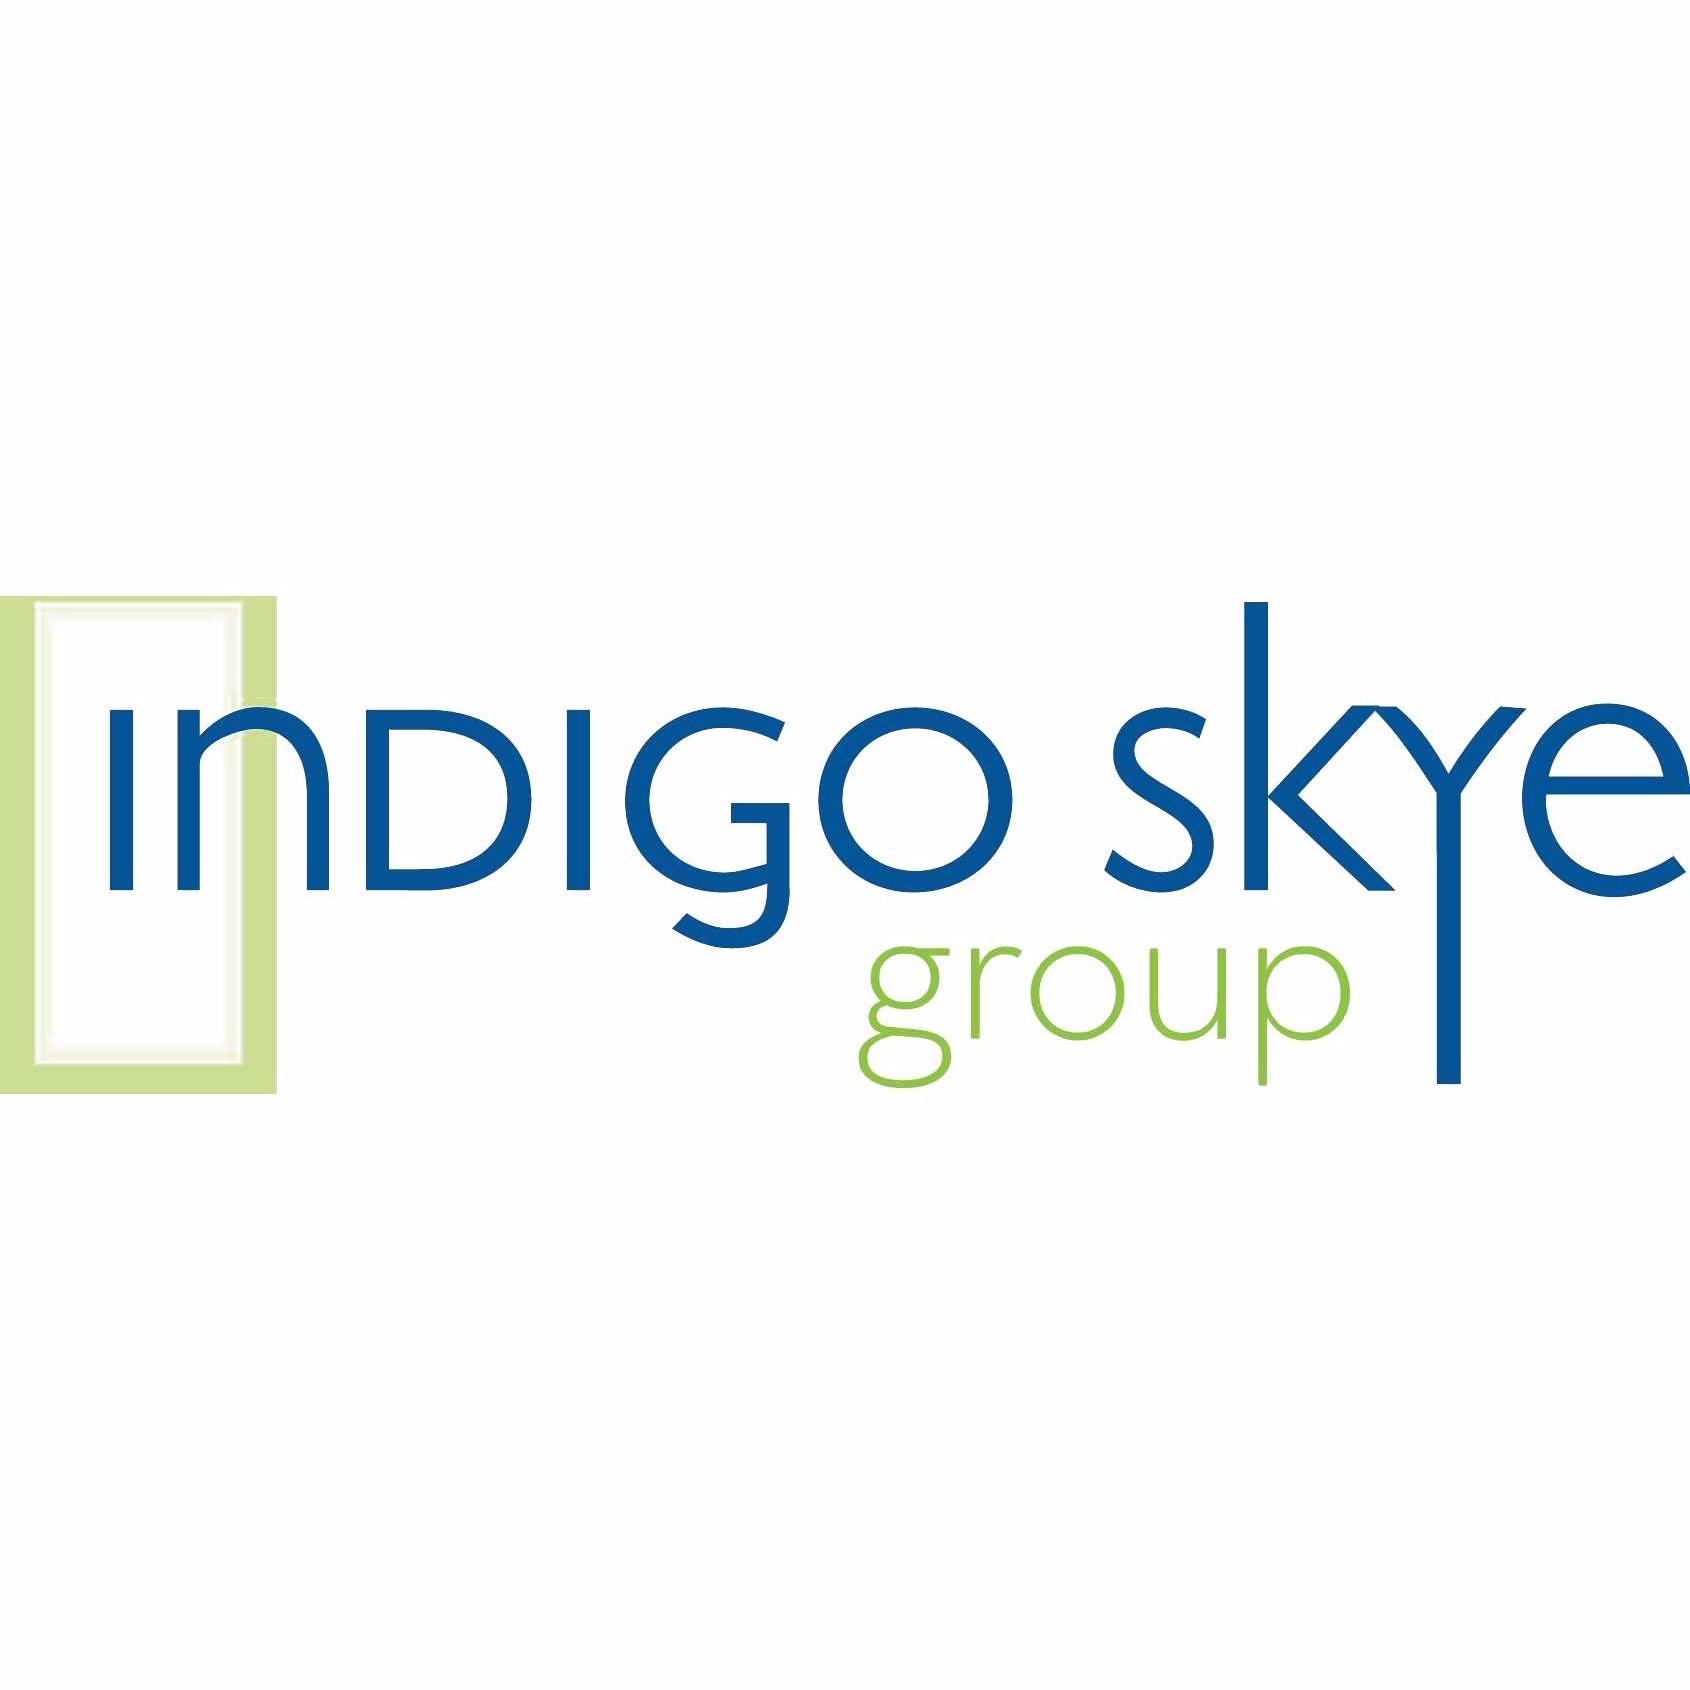 The Indigo Skye GroupKeller Williams Realty - Plano  (KELR02)